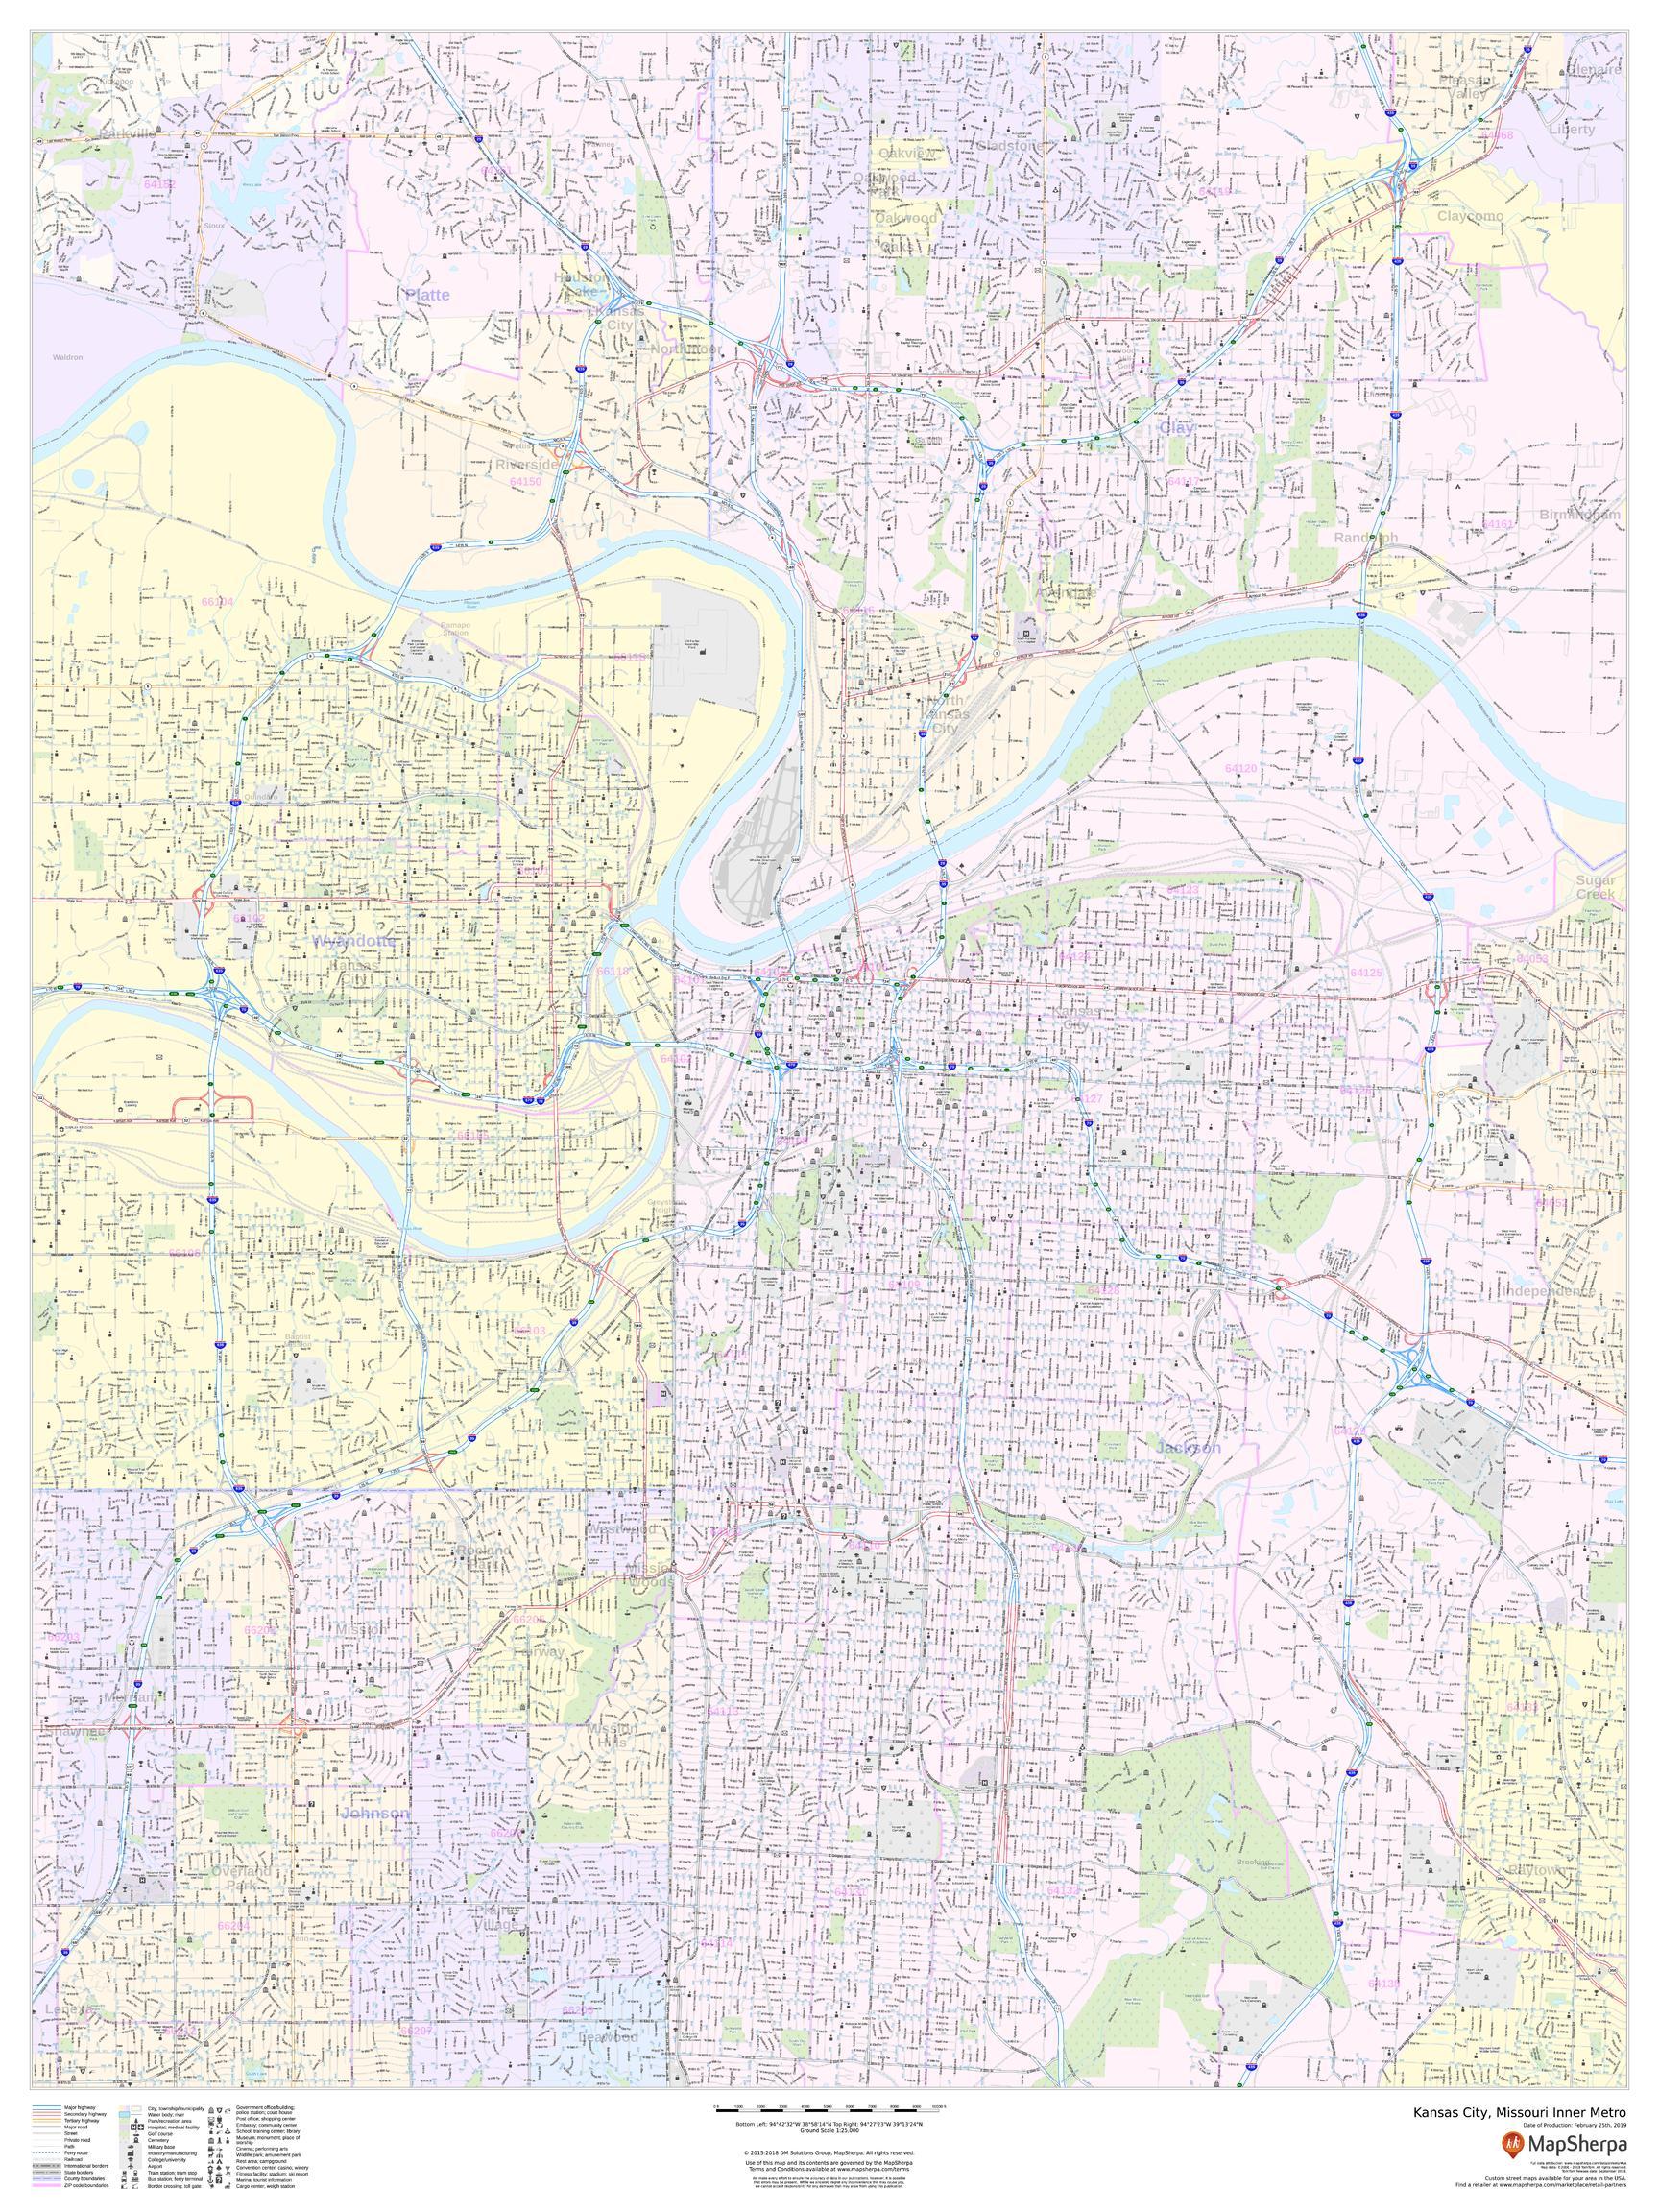 Kansas City, Missouri Inner Metro - Portrait Map